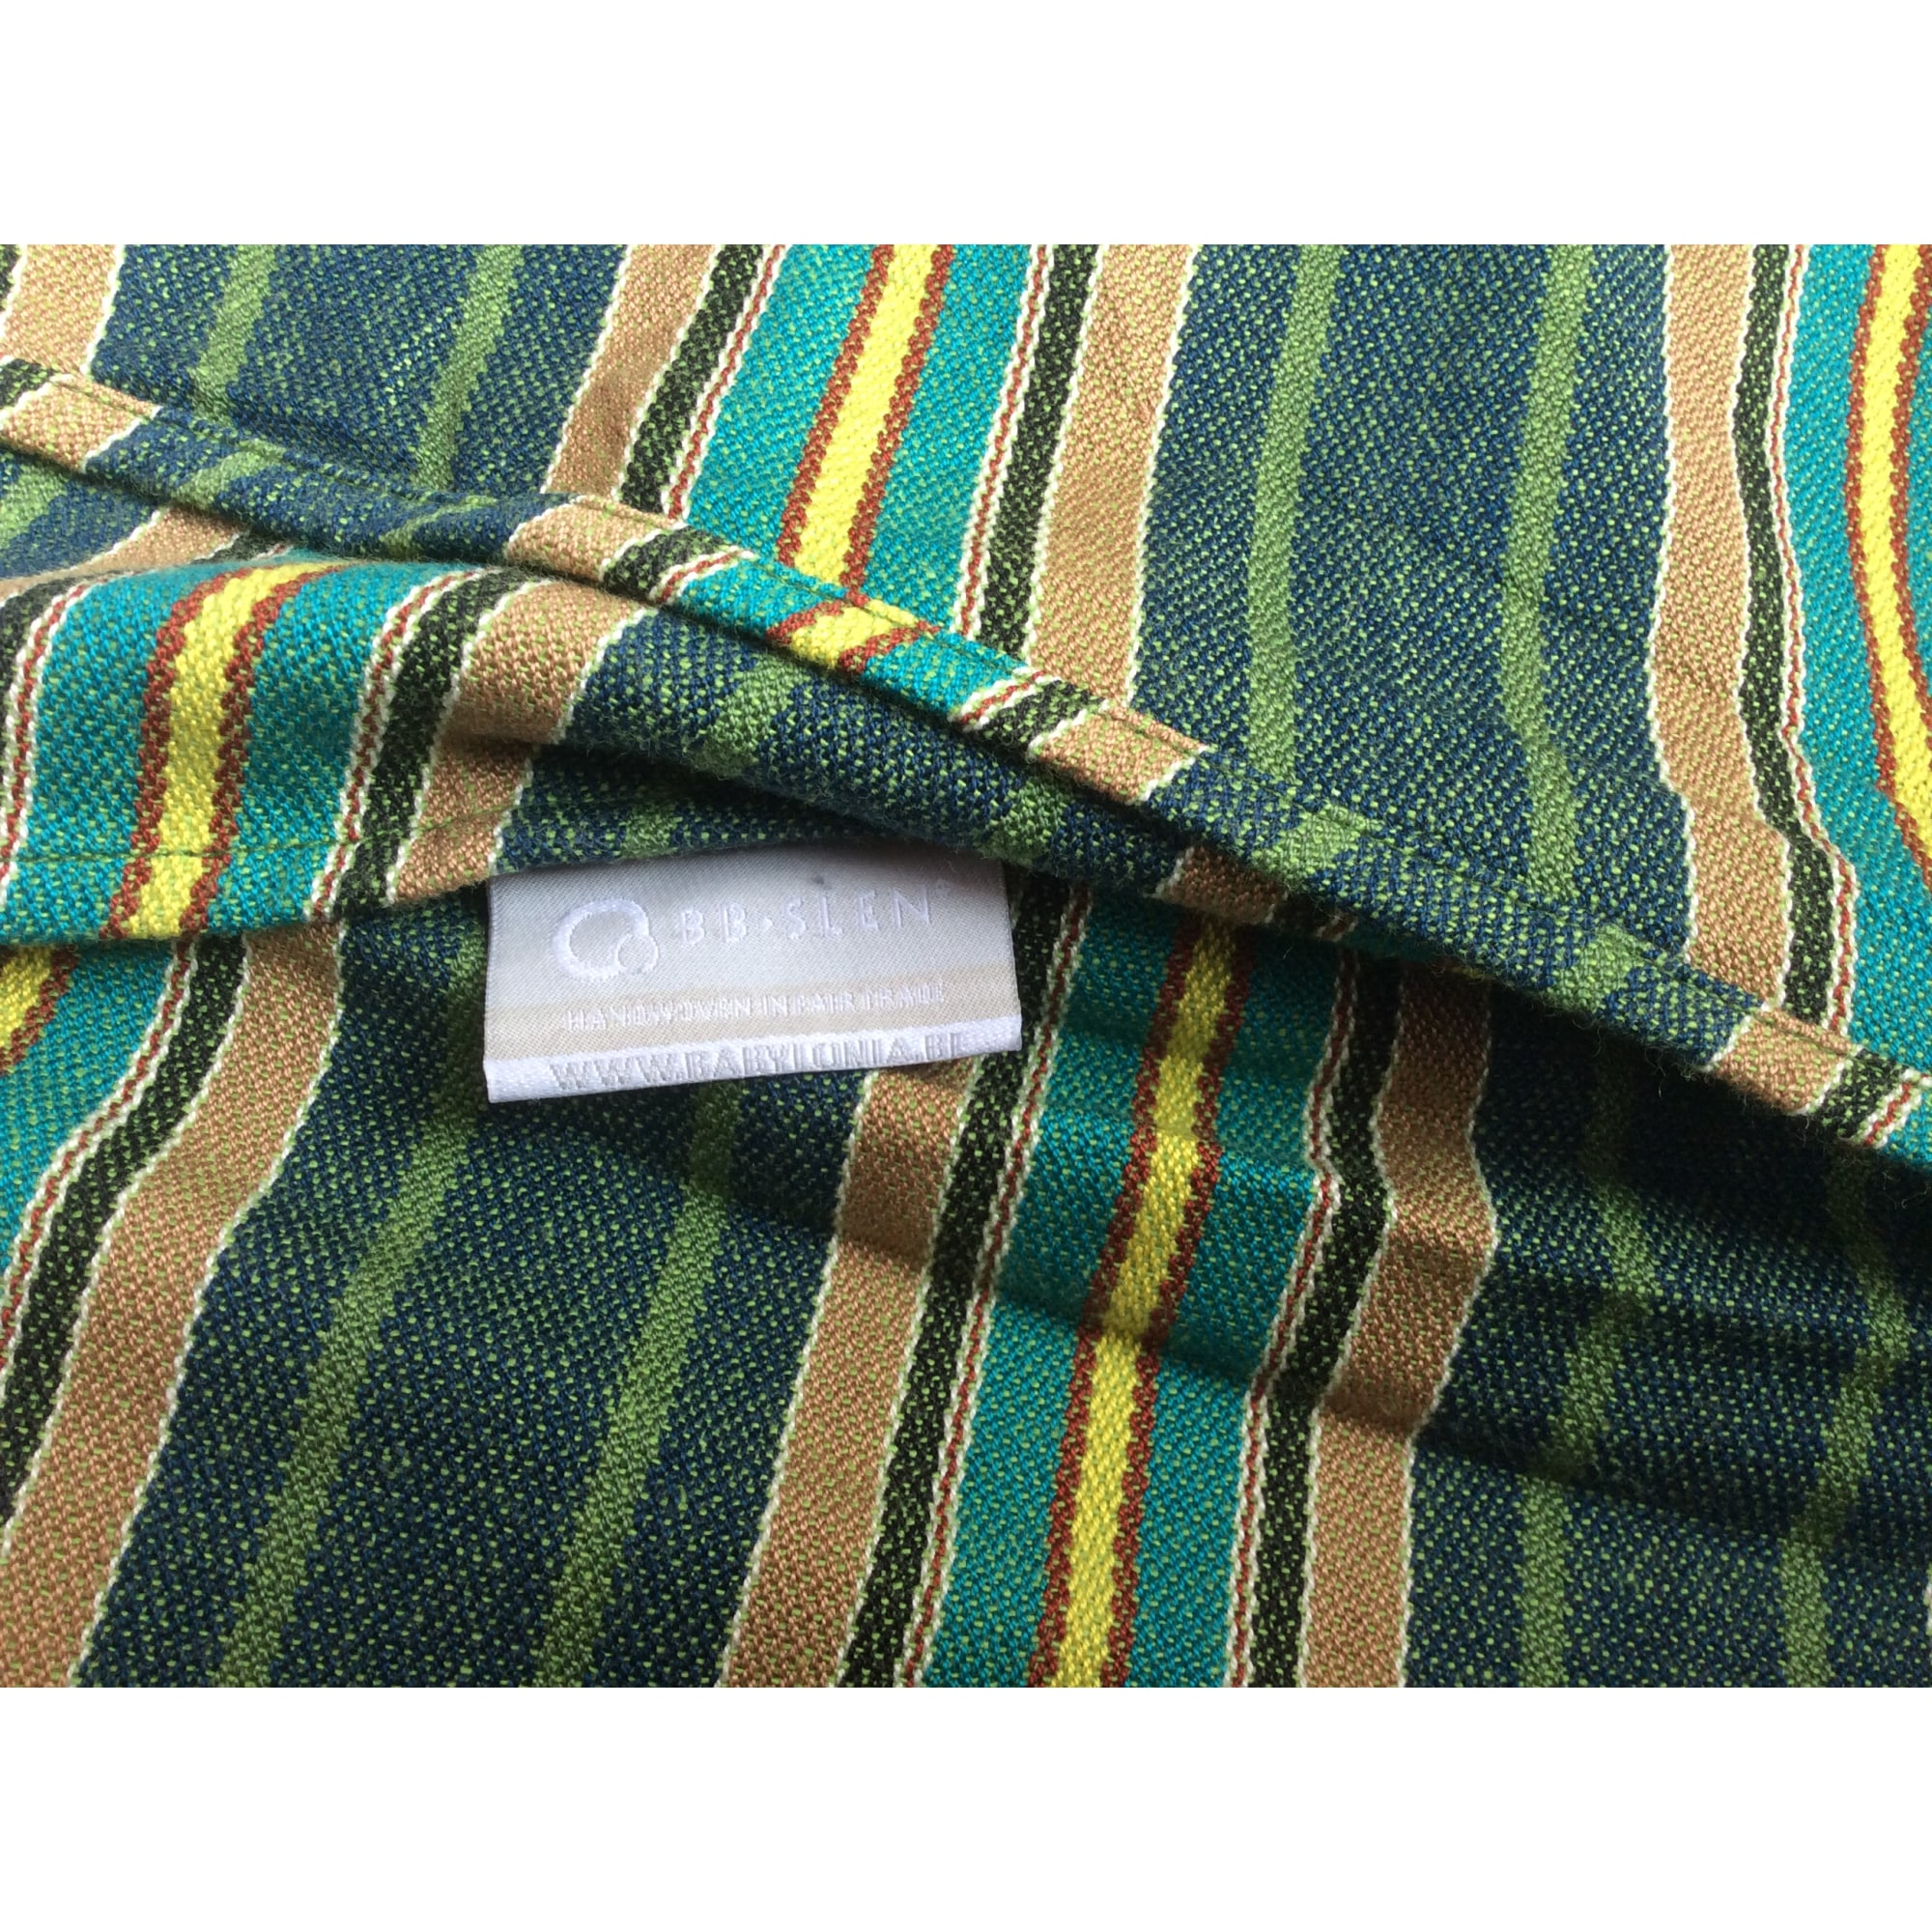 Echarpe Babylonia achat   vente de Echarpe pas cher 3b1eb1443fe